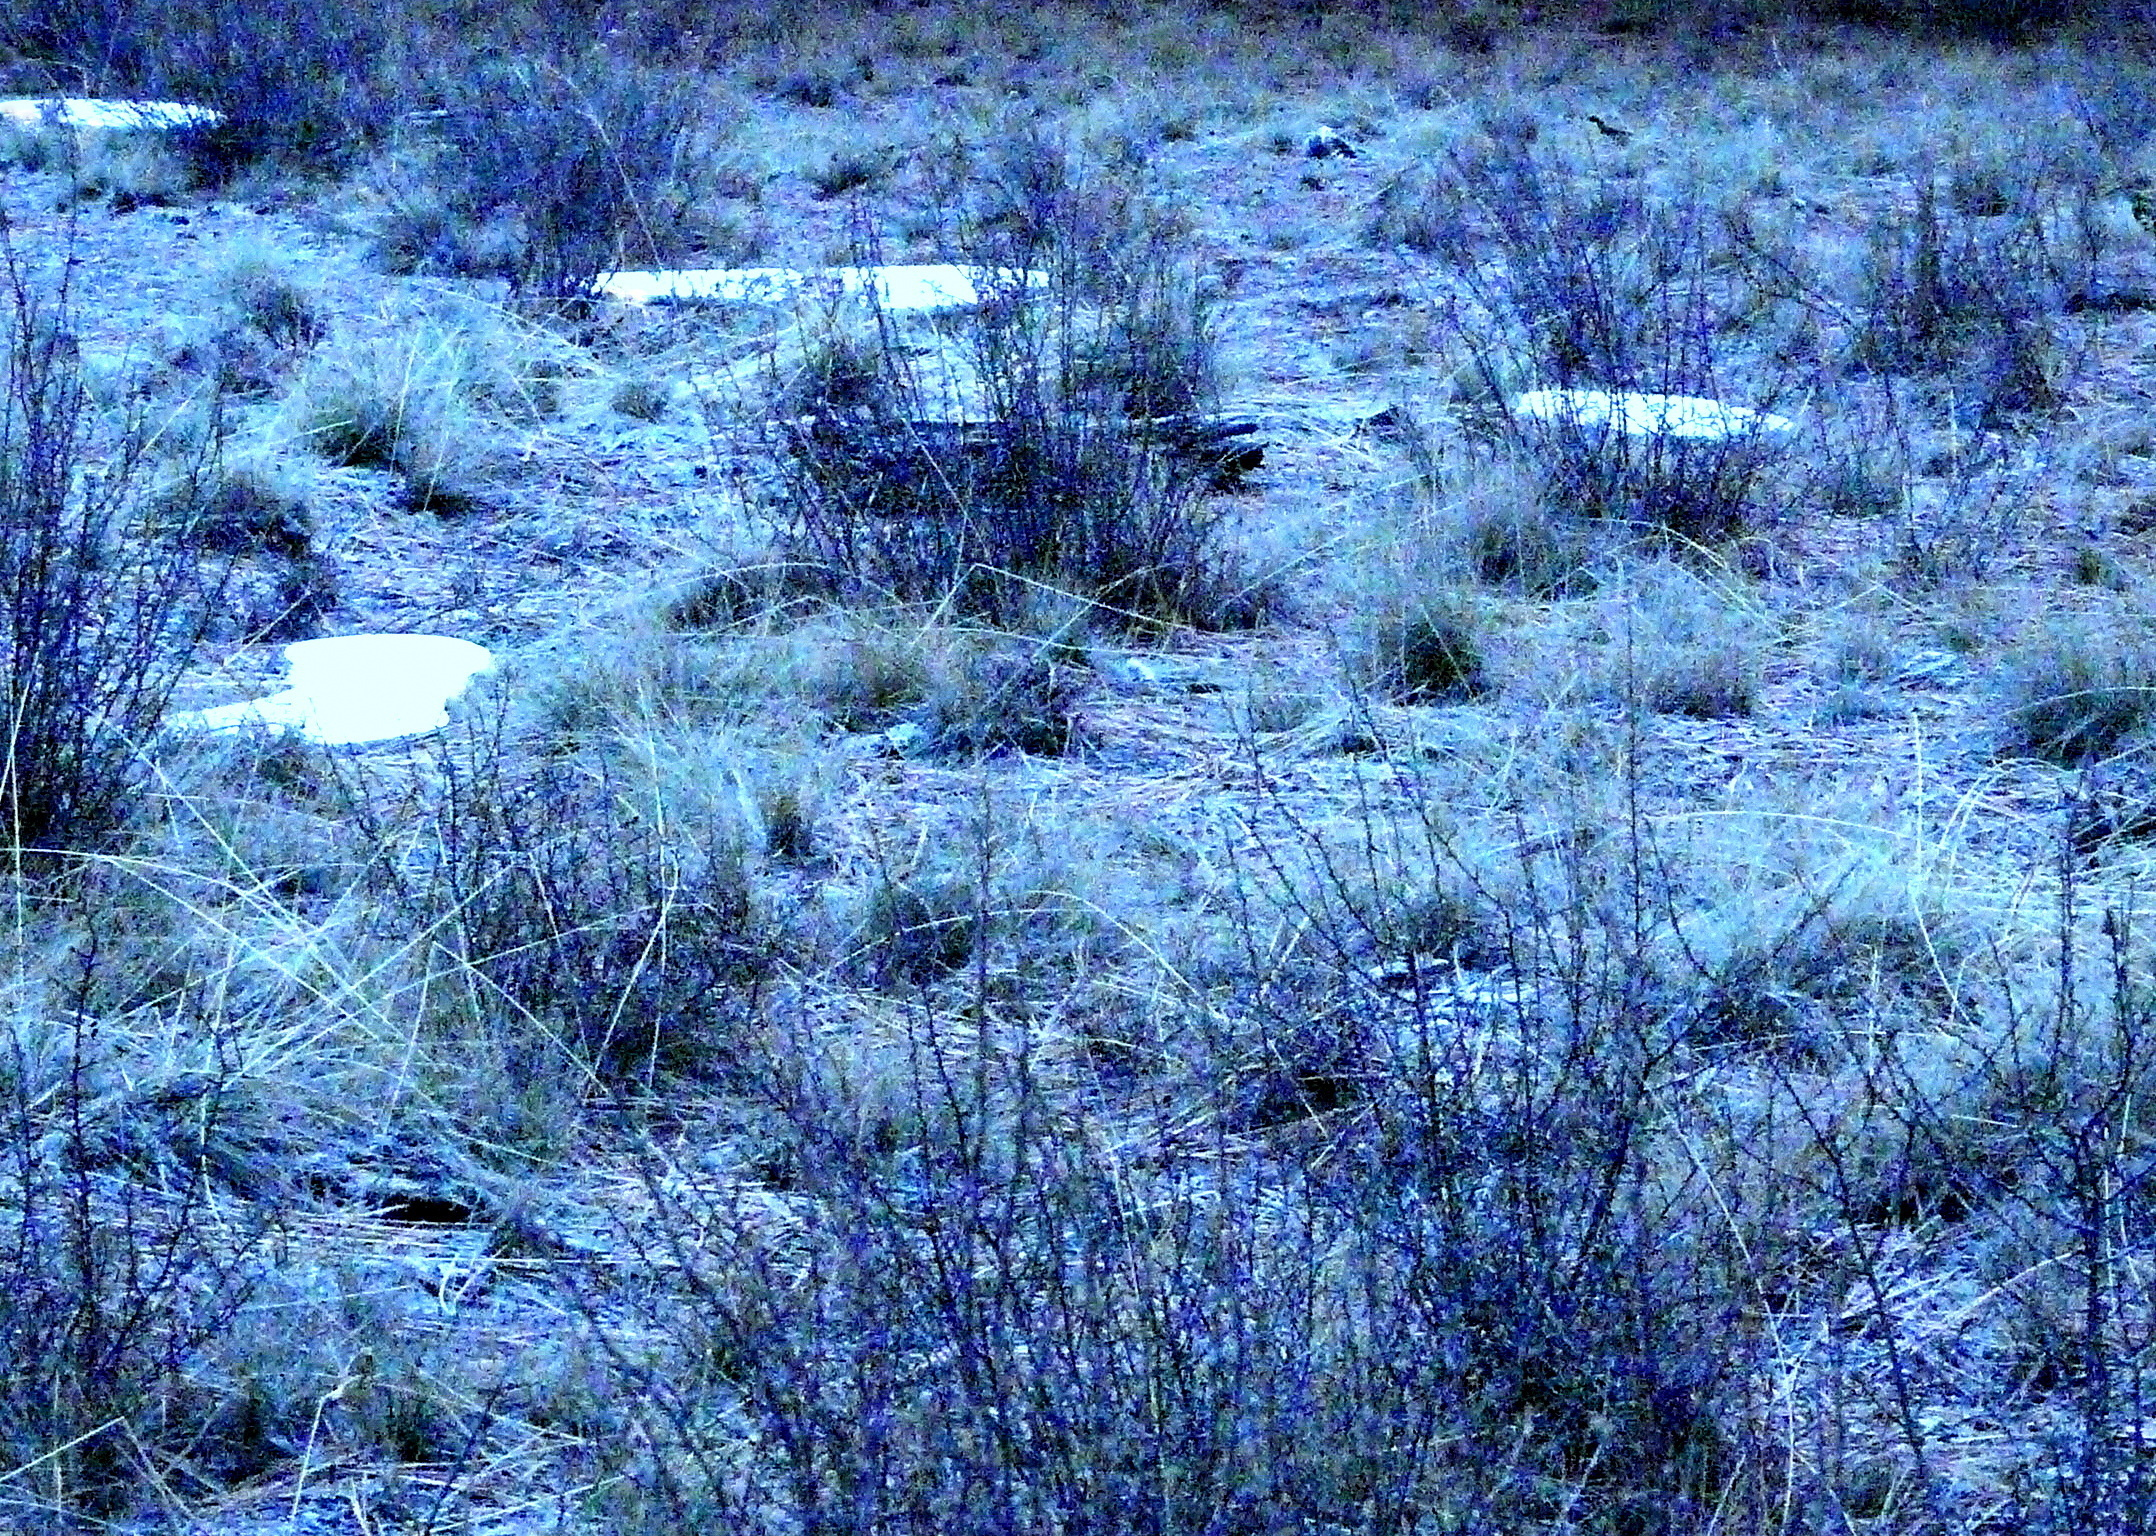 Snow remnants